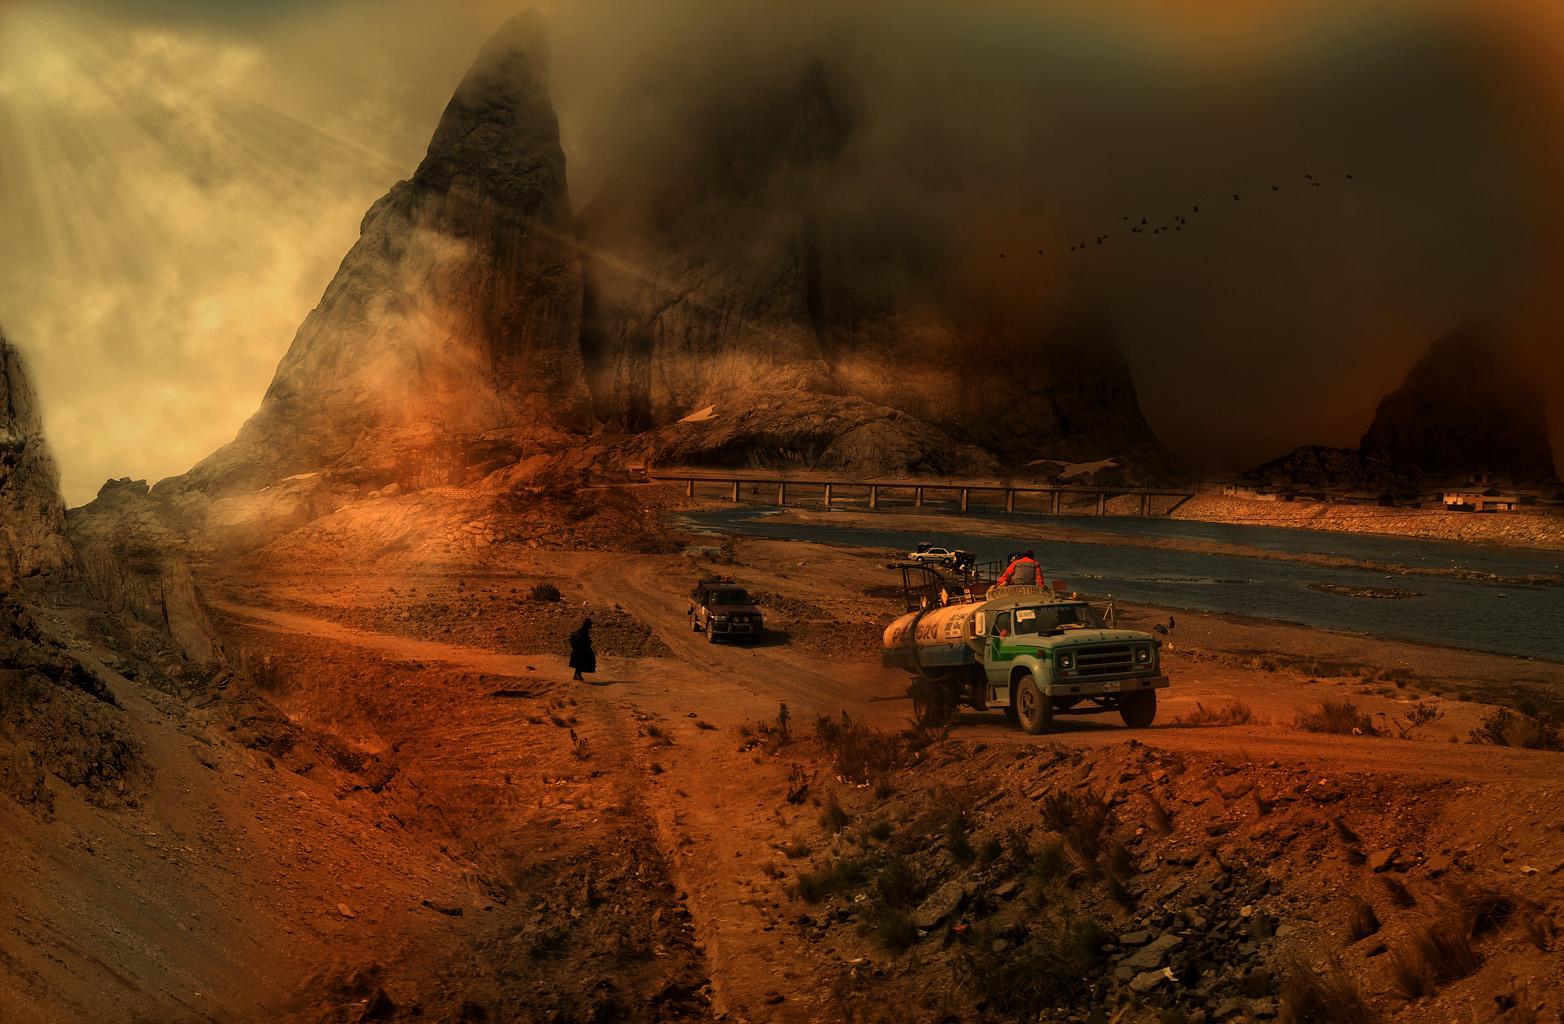 """Proyecto 2012/01: Altiplano peruano"" de Tim Rüth"